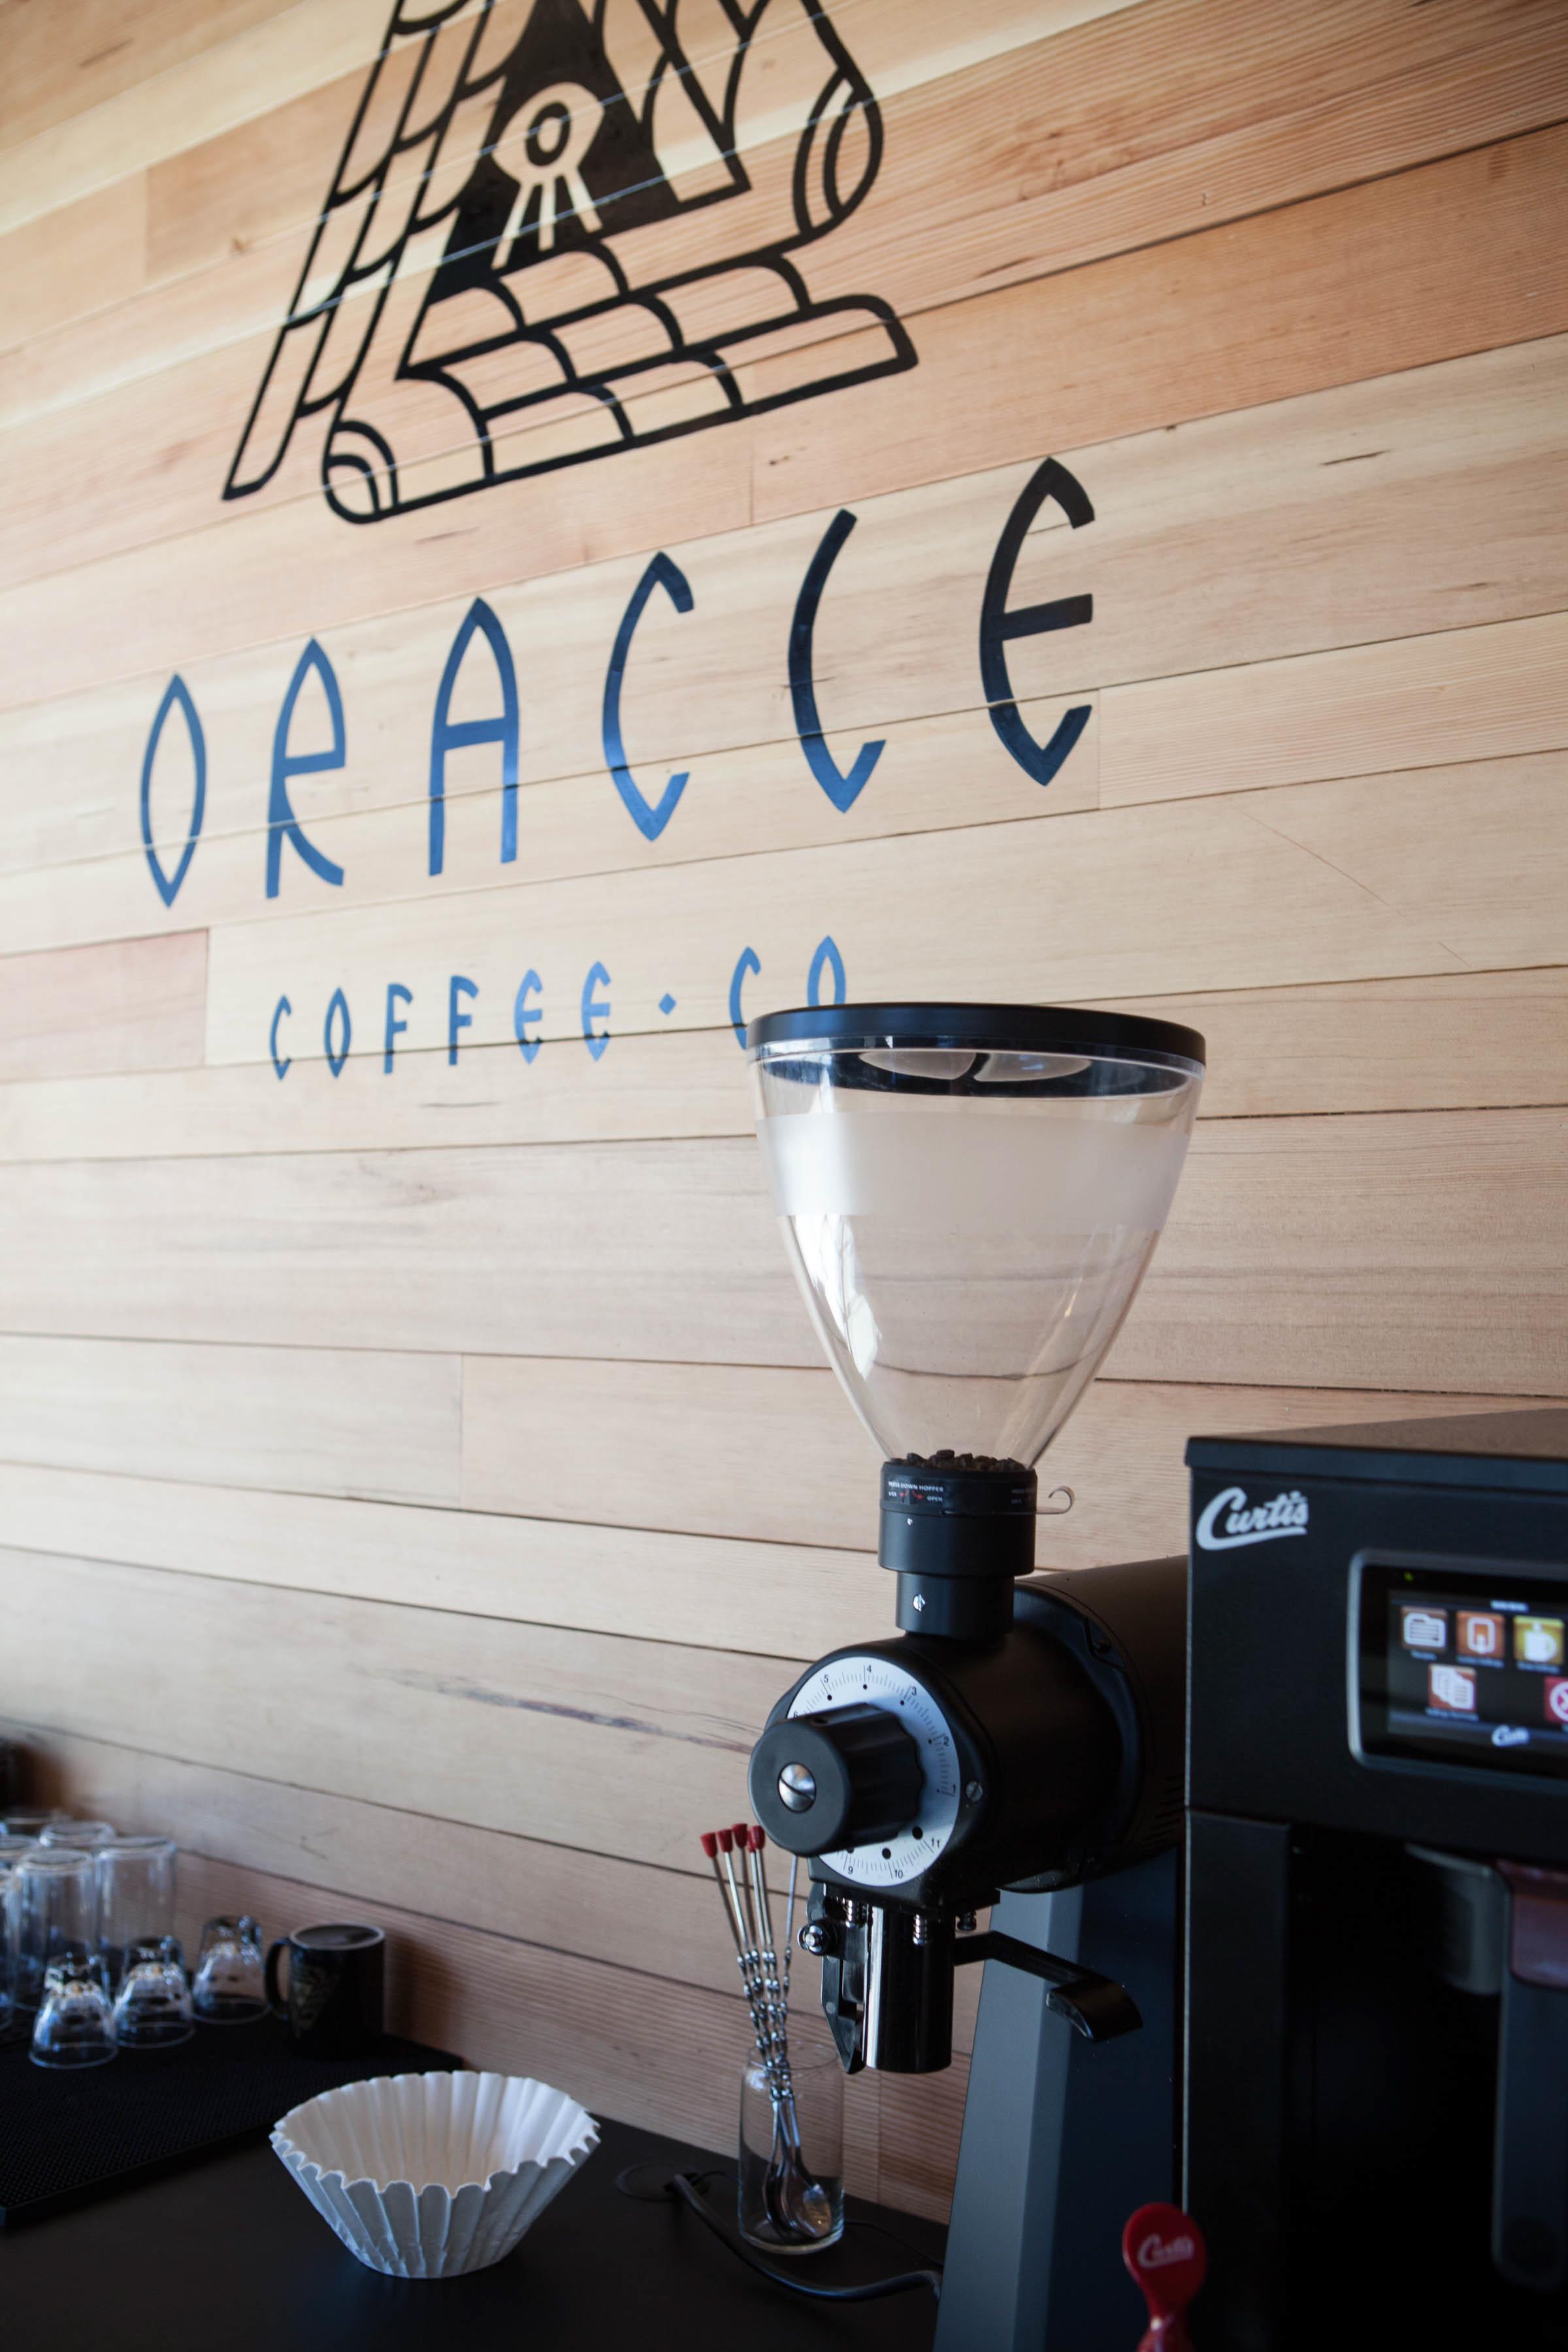 oraclecoffee_brettschulz-1.jpg